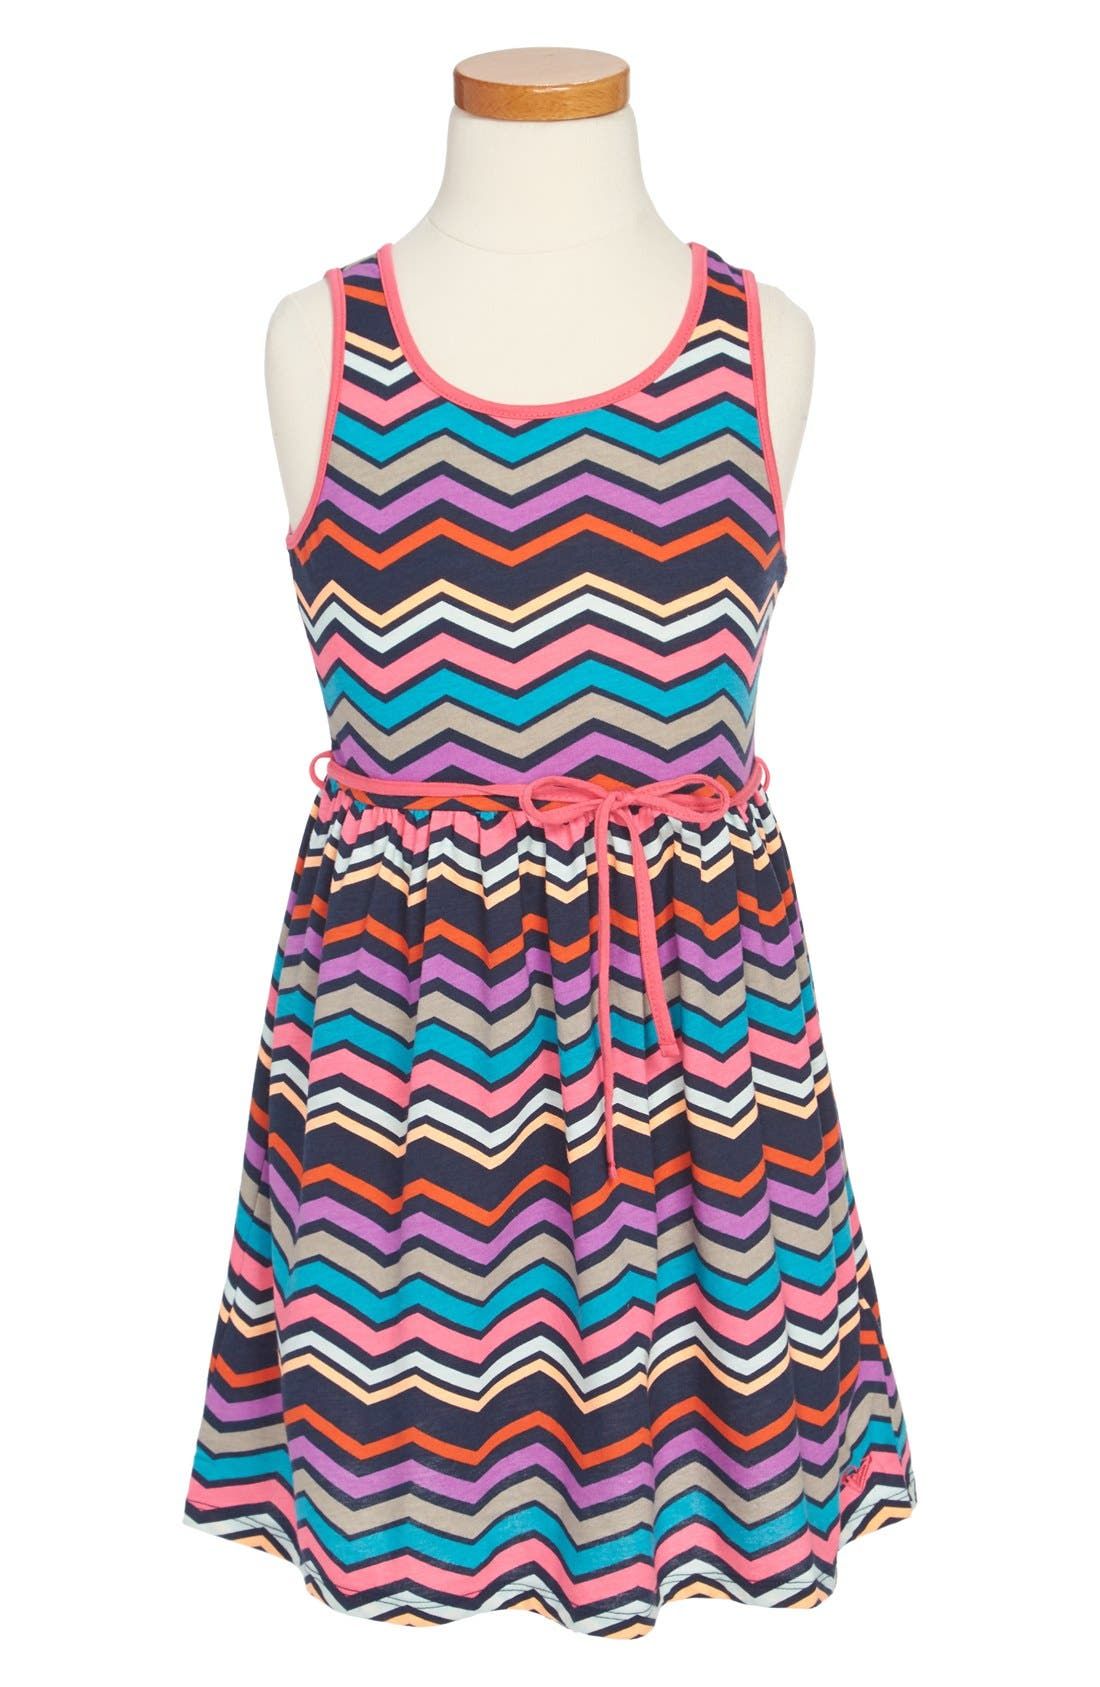 Alternate Image 1 Selected - Roxy 'Sweltering Heart' Tank Dress (Little Girls & Big Girls)